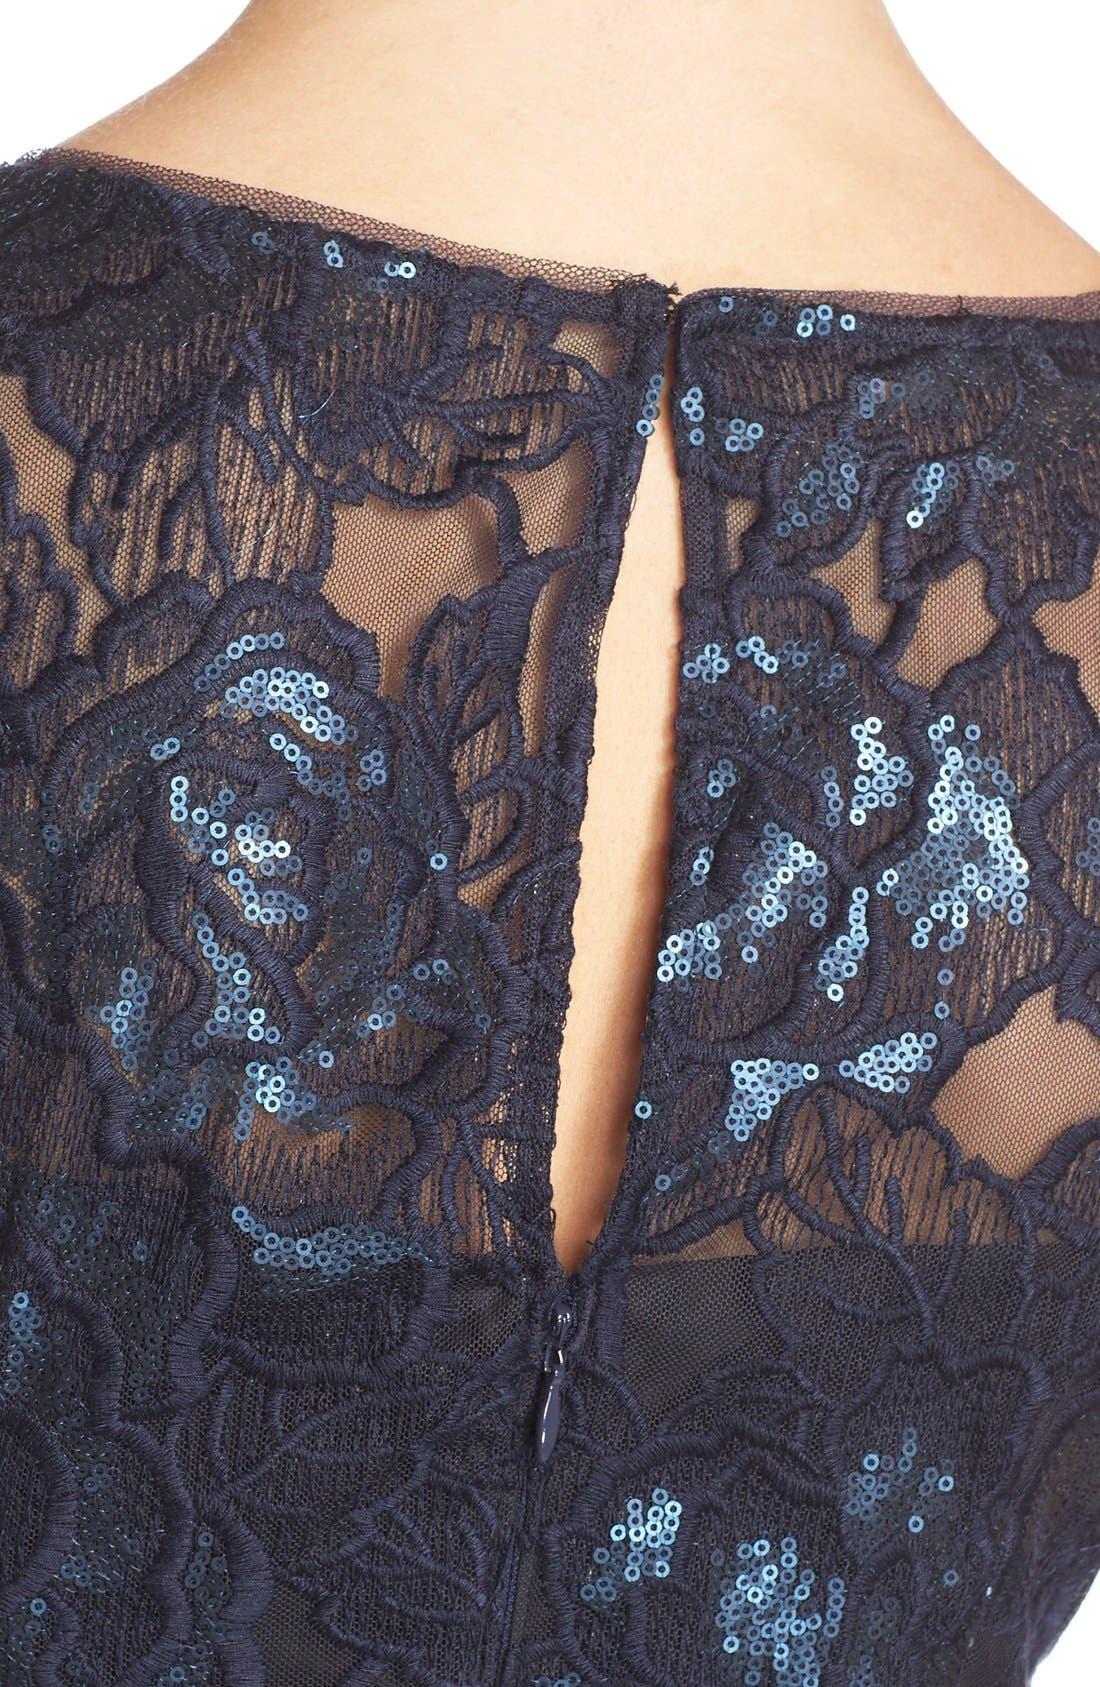 Illusion Sequin Lace Sheath Dress,                             Alternate thumbnail 5, color,                             412